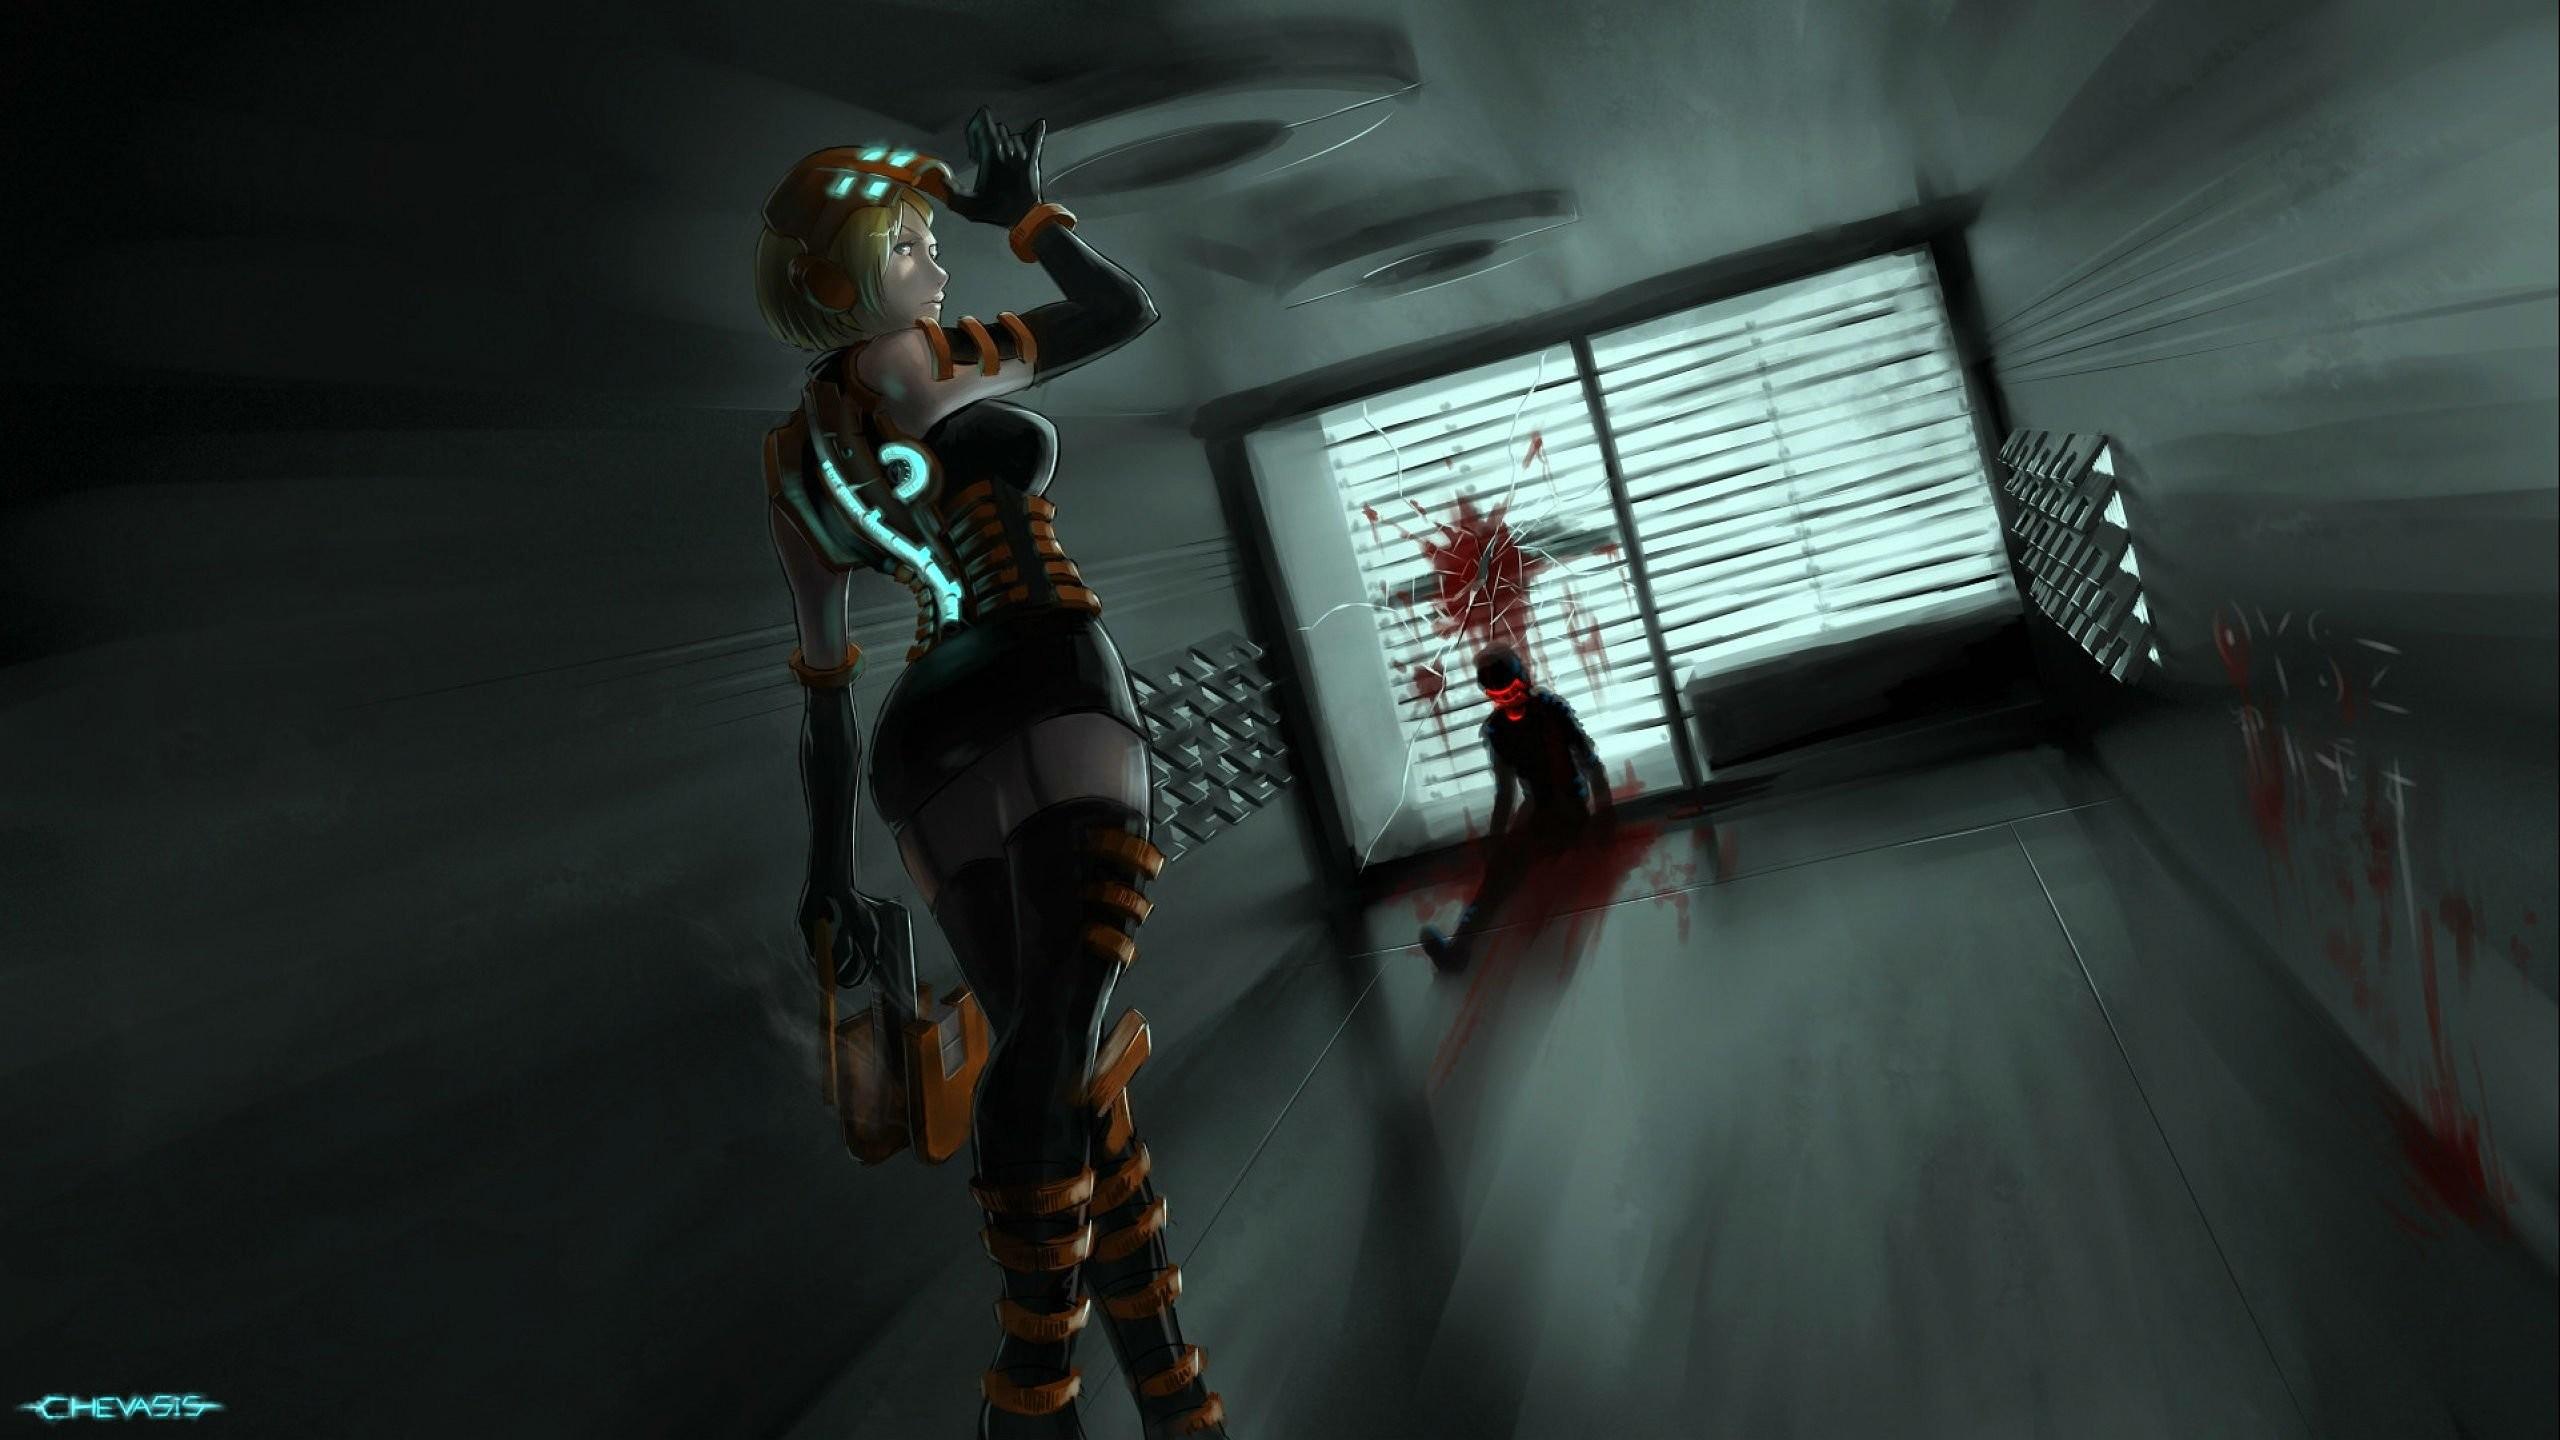 Res: 2560x1440, DEAD SPACE sci-fi shooter action futuristic 1deads warrior cyborg robot alien  aliens artwork deadspace fighting wallpaper |  | 740426 |  WallpaperUP